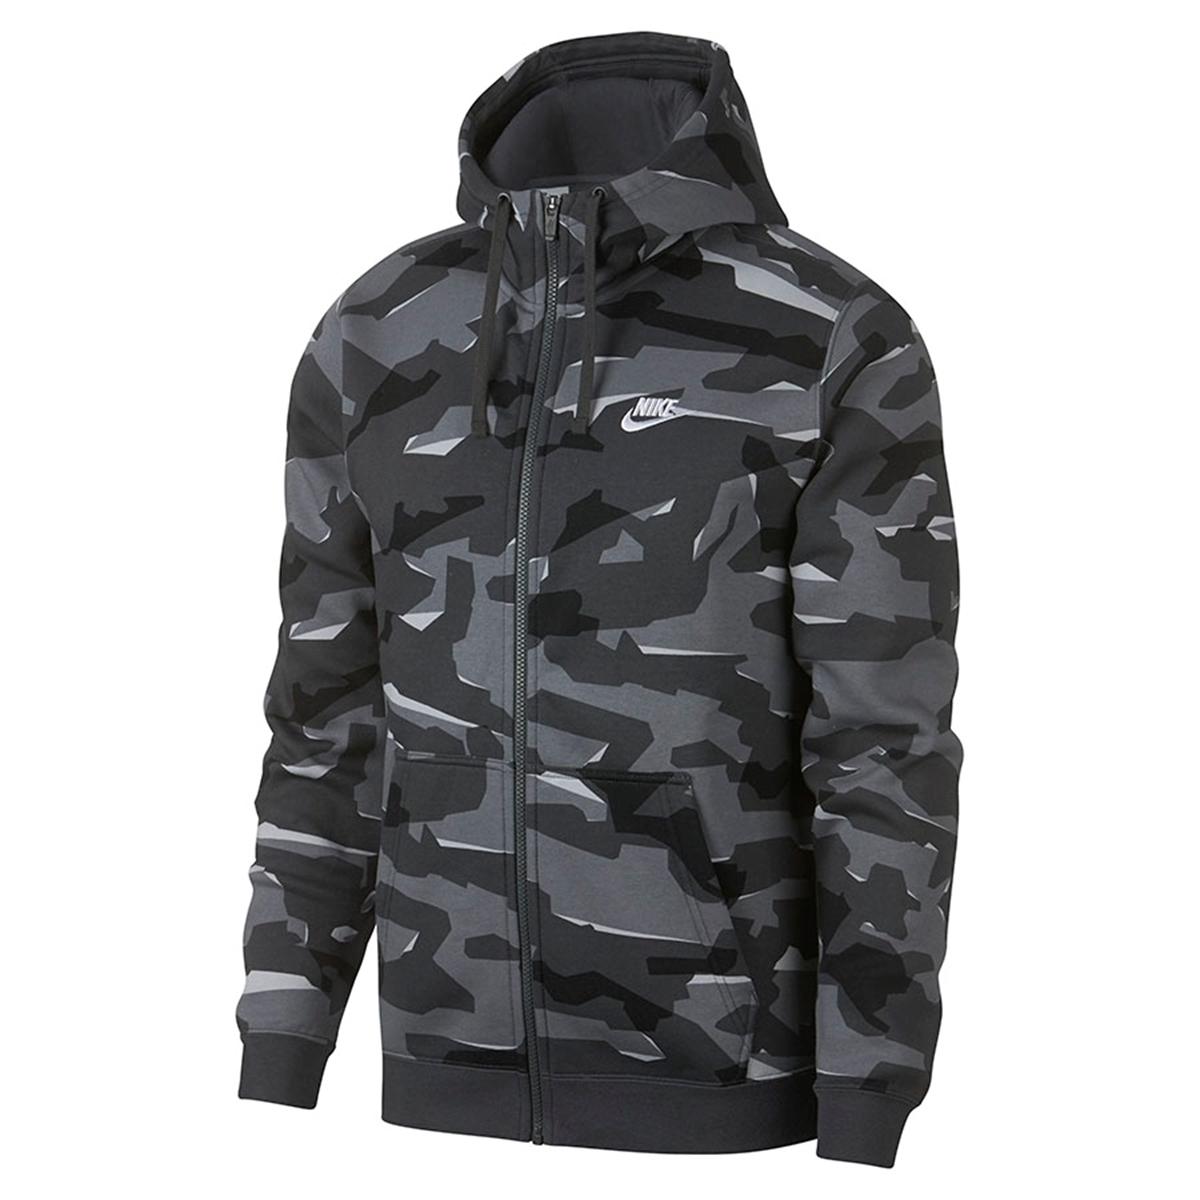 811da00f Nike m nsw club camo hoodie fz AJ2105-065- Nava Sport - Vi selger ...